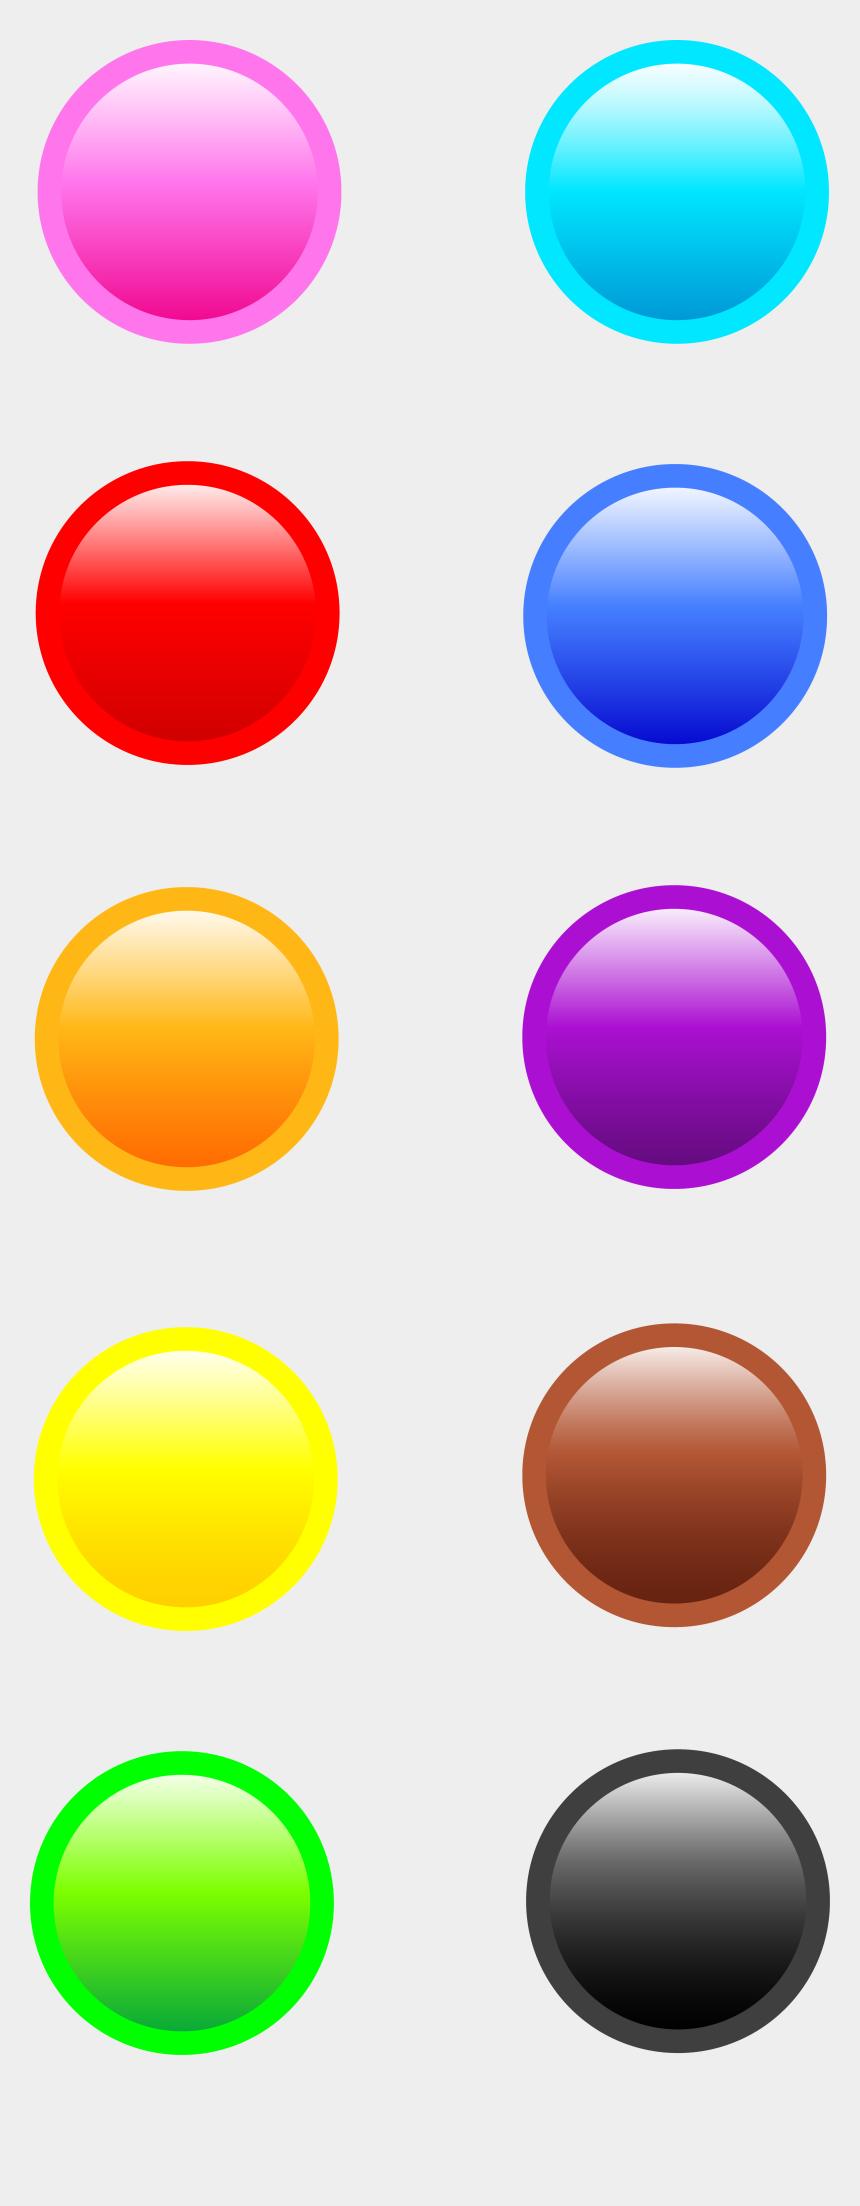 button clipart, Cartoons - Button Clipart Website Png - Web Round Button